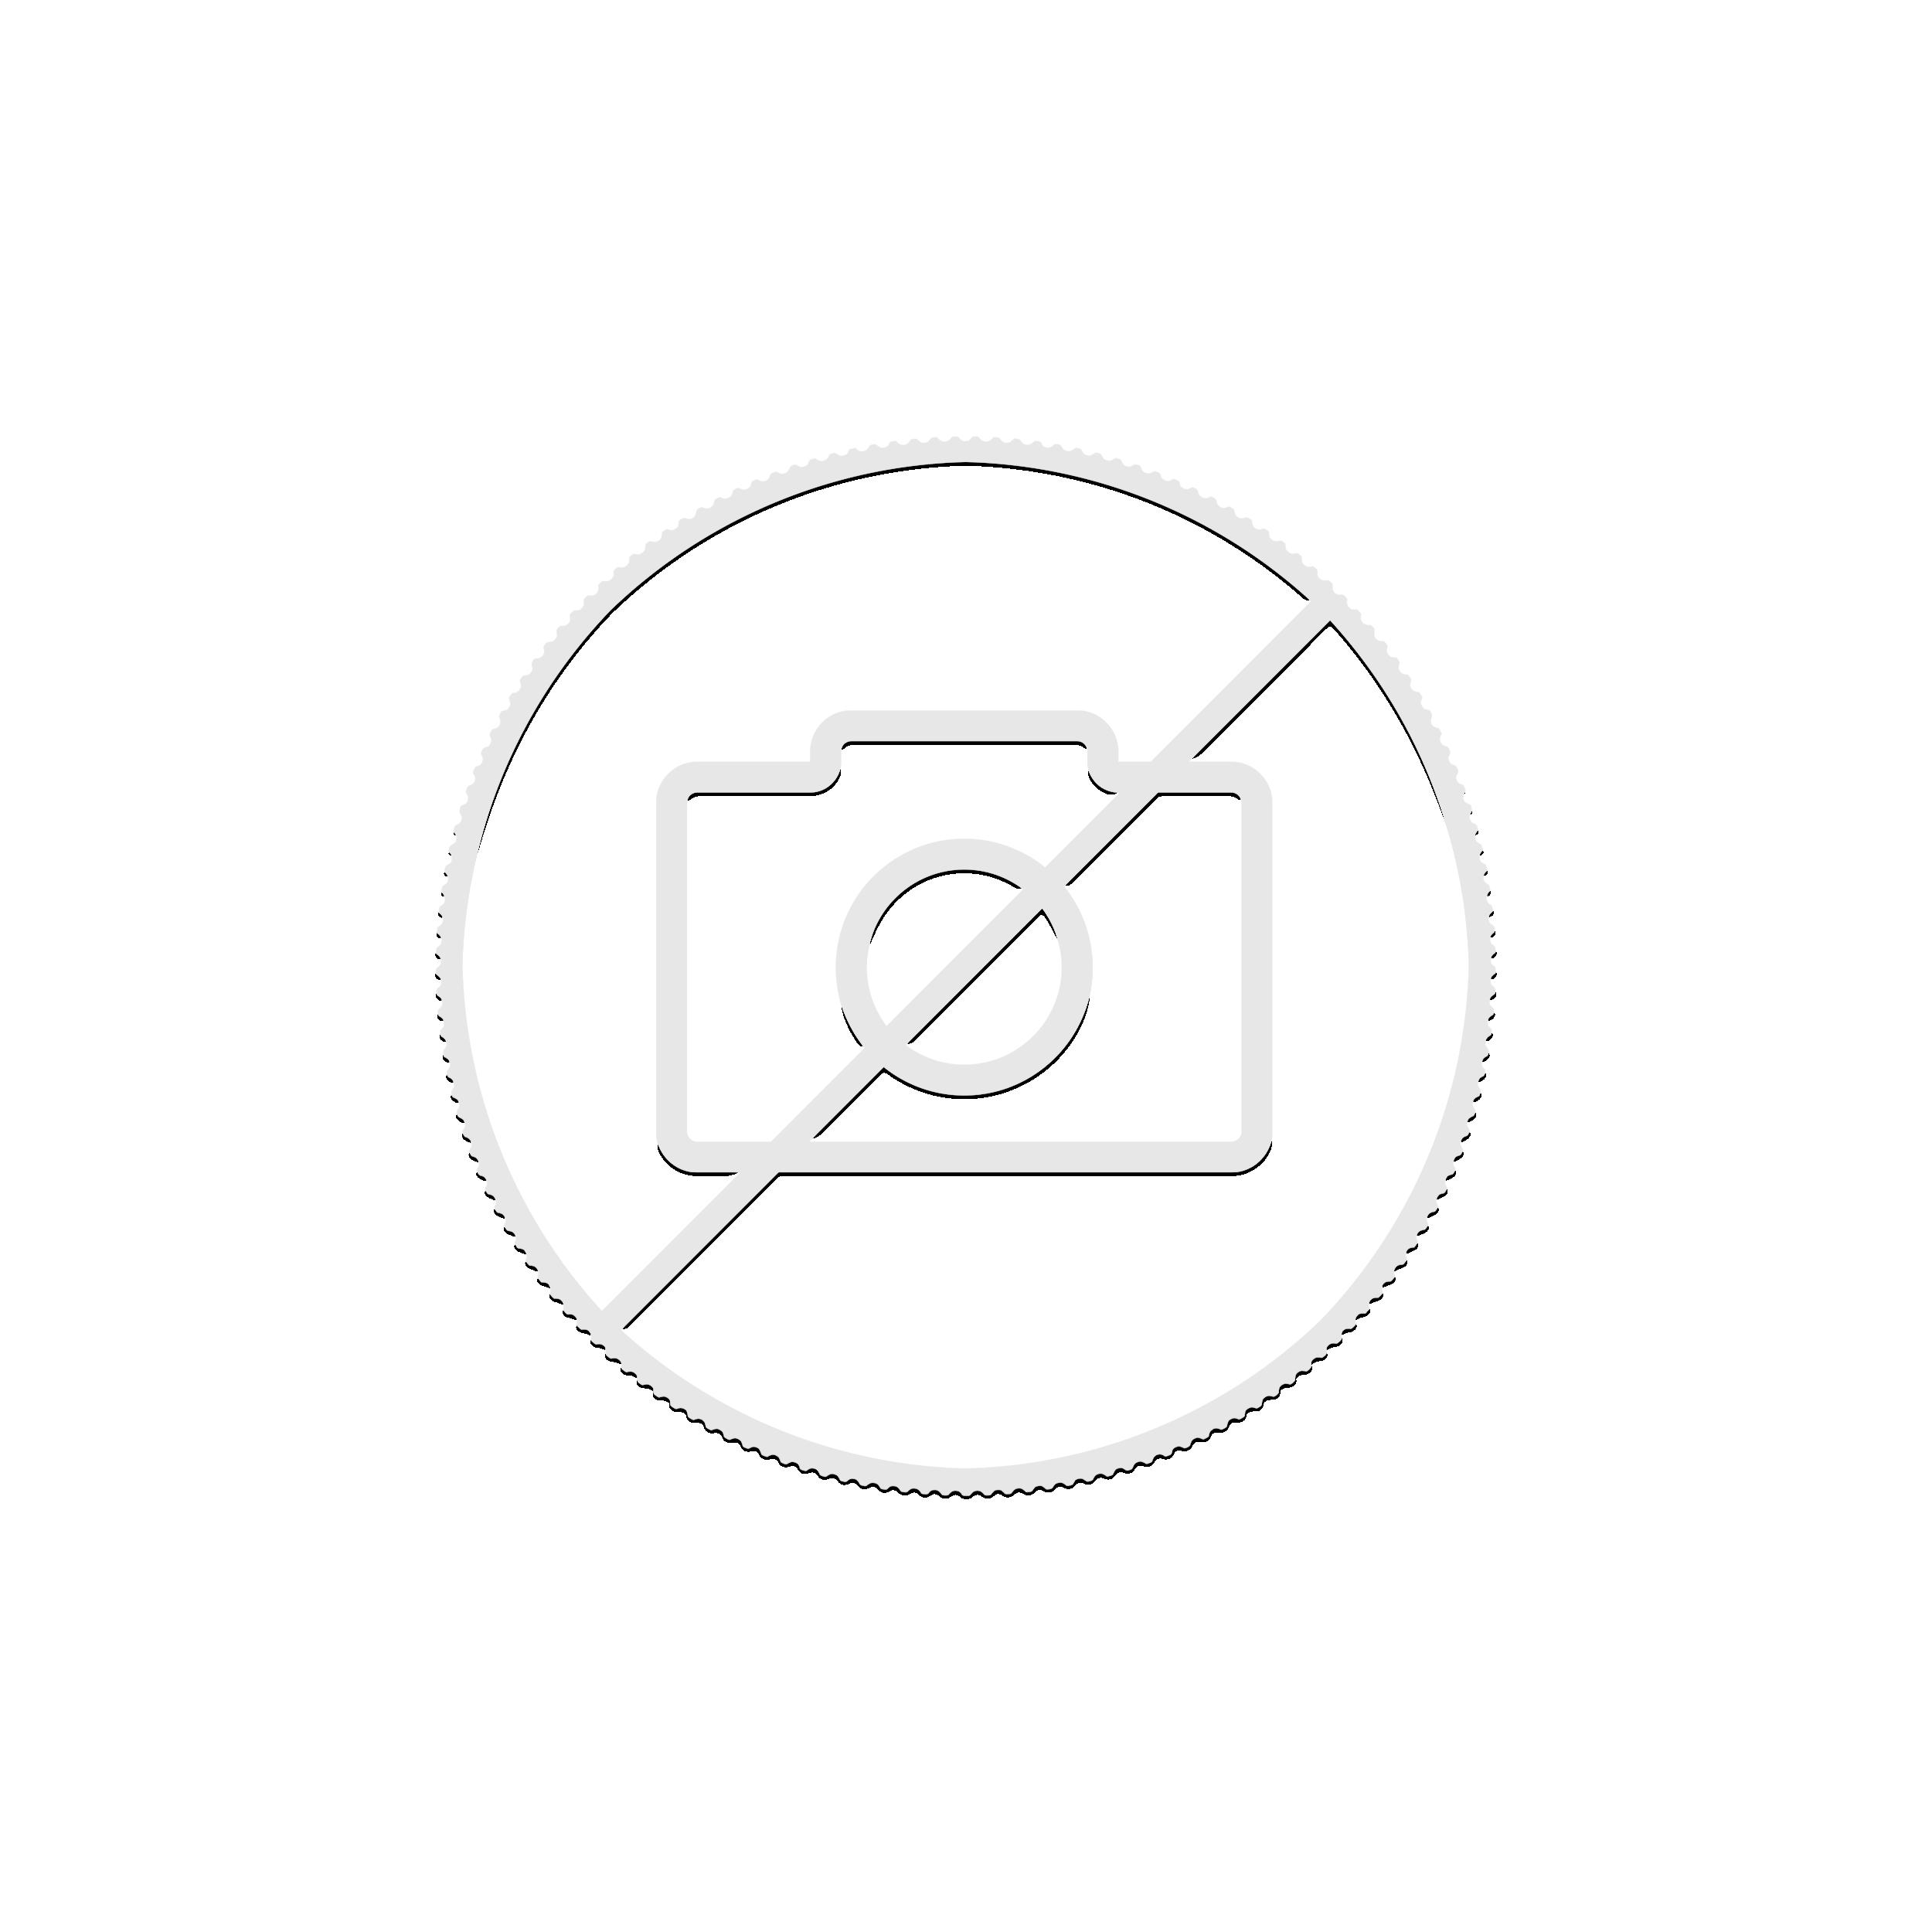 10 troy ounce zilver Kookaburra munt 2014